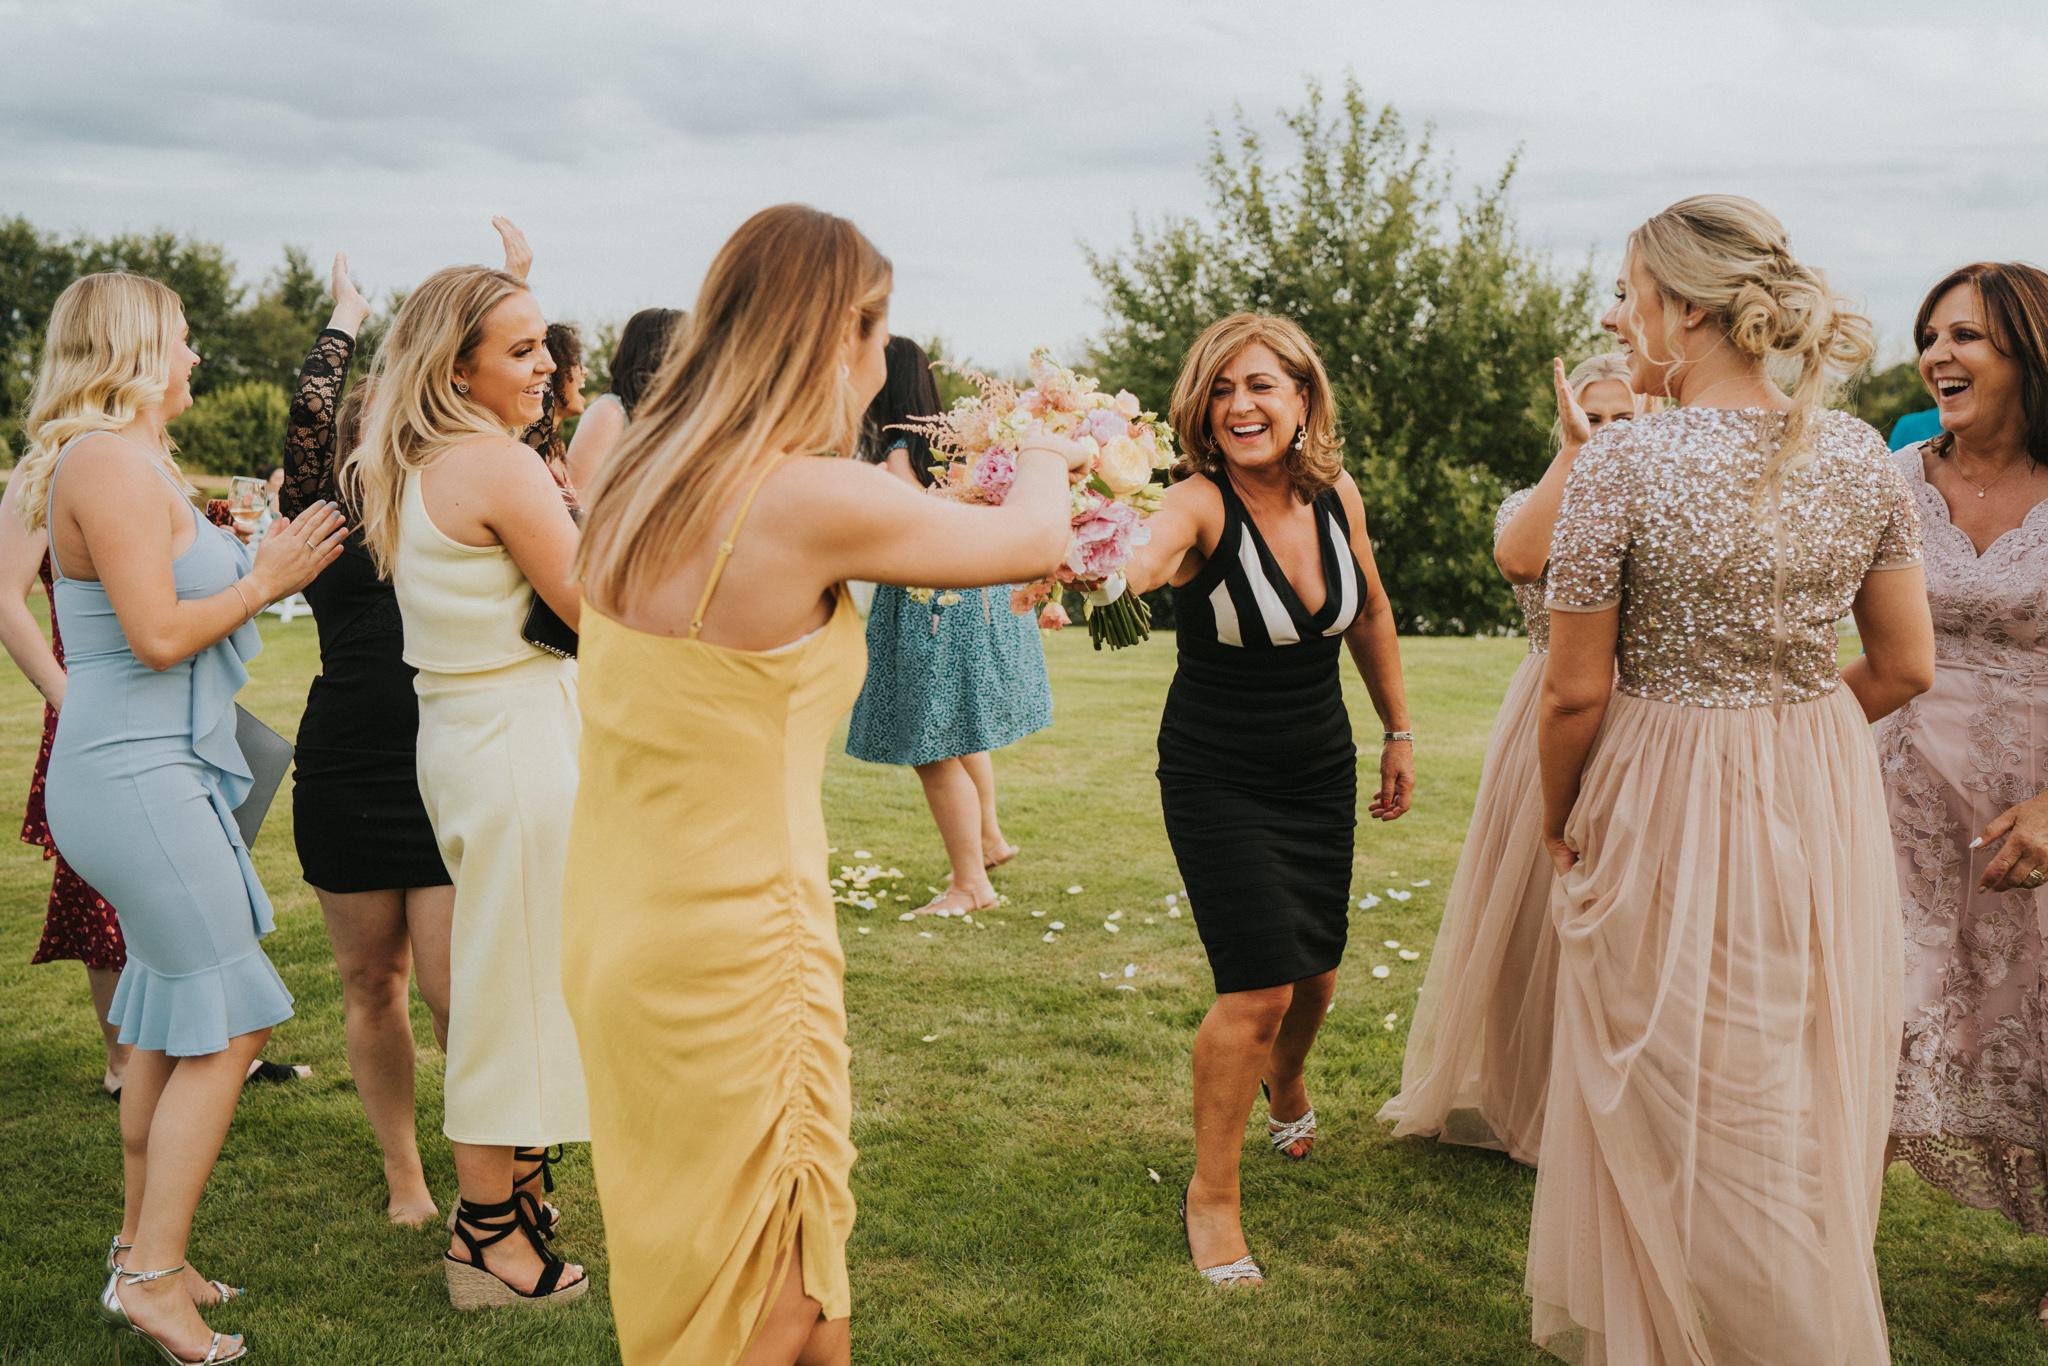 danielle-and-gareths-boho-wedding-previews-at-high-house-weddings-grace-elizabeth-colchester-essex-suffolk-norfolk-devon-alternative-wedding-and-lifestyle-photographer (70 of 76).jpg